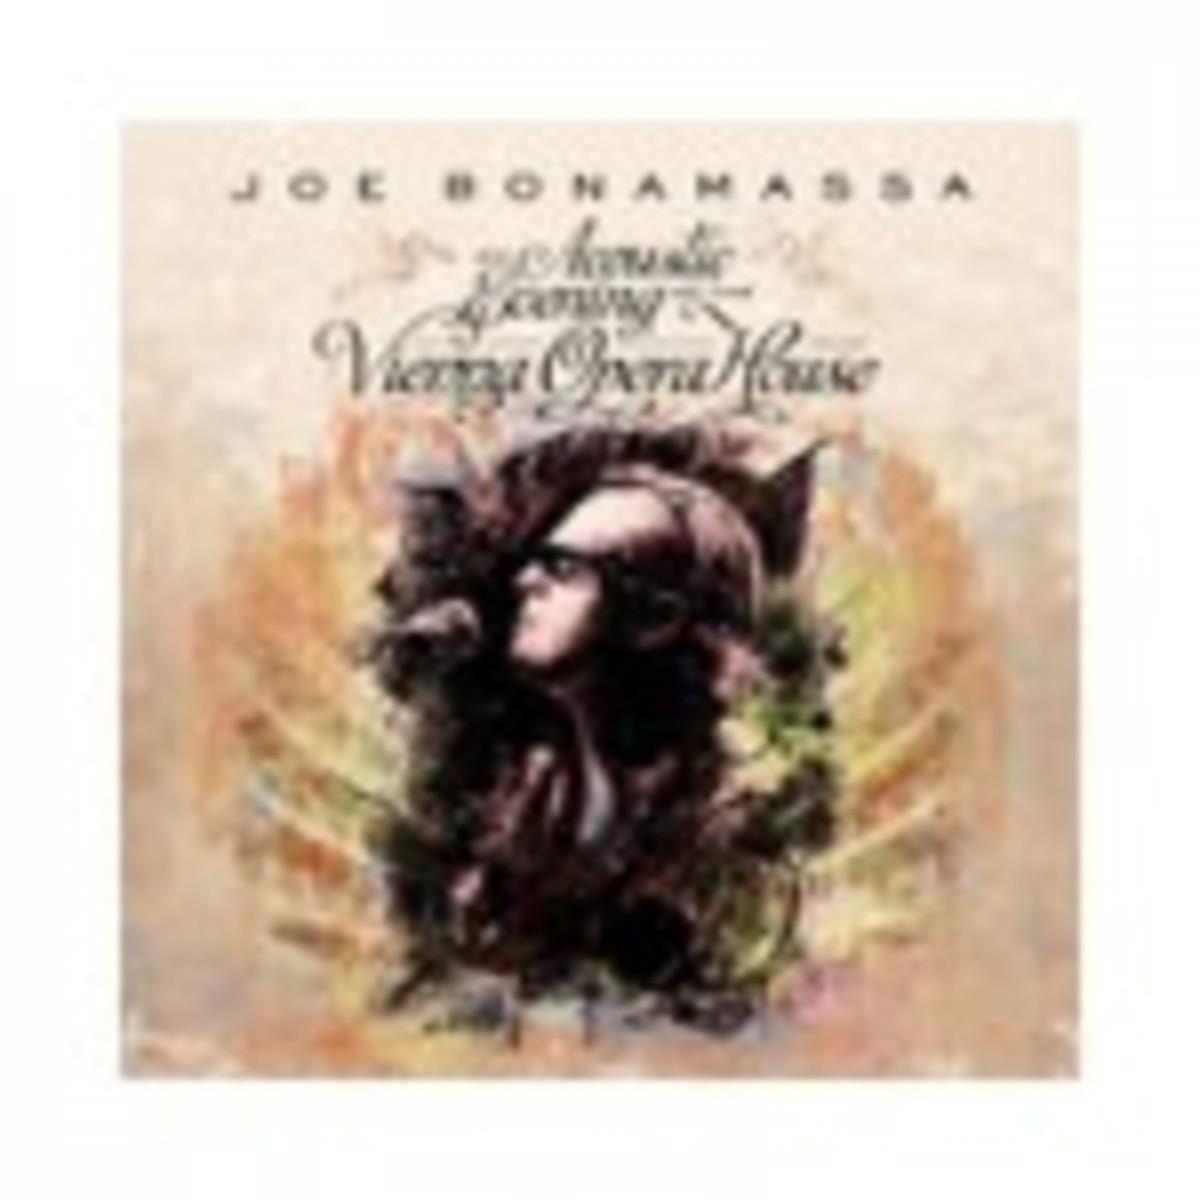 Joe bonamassa Live Vienna Opera House